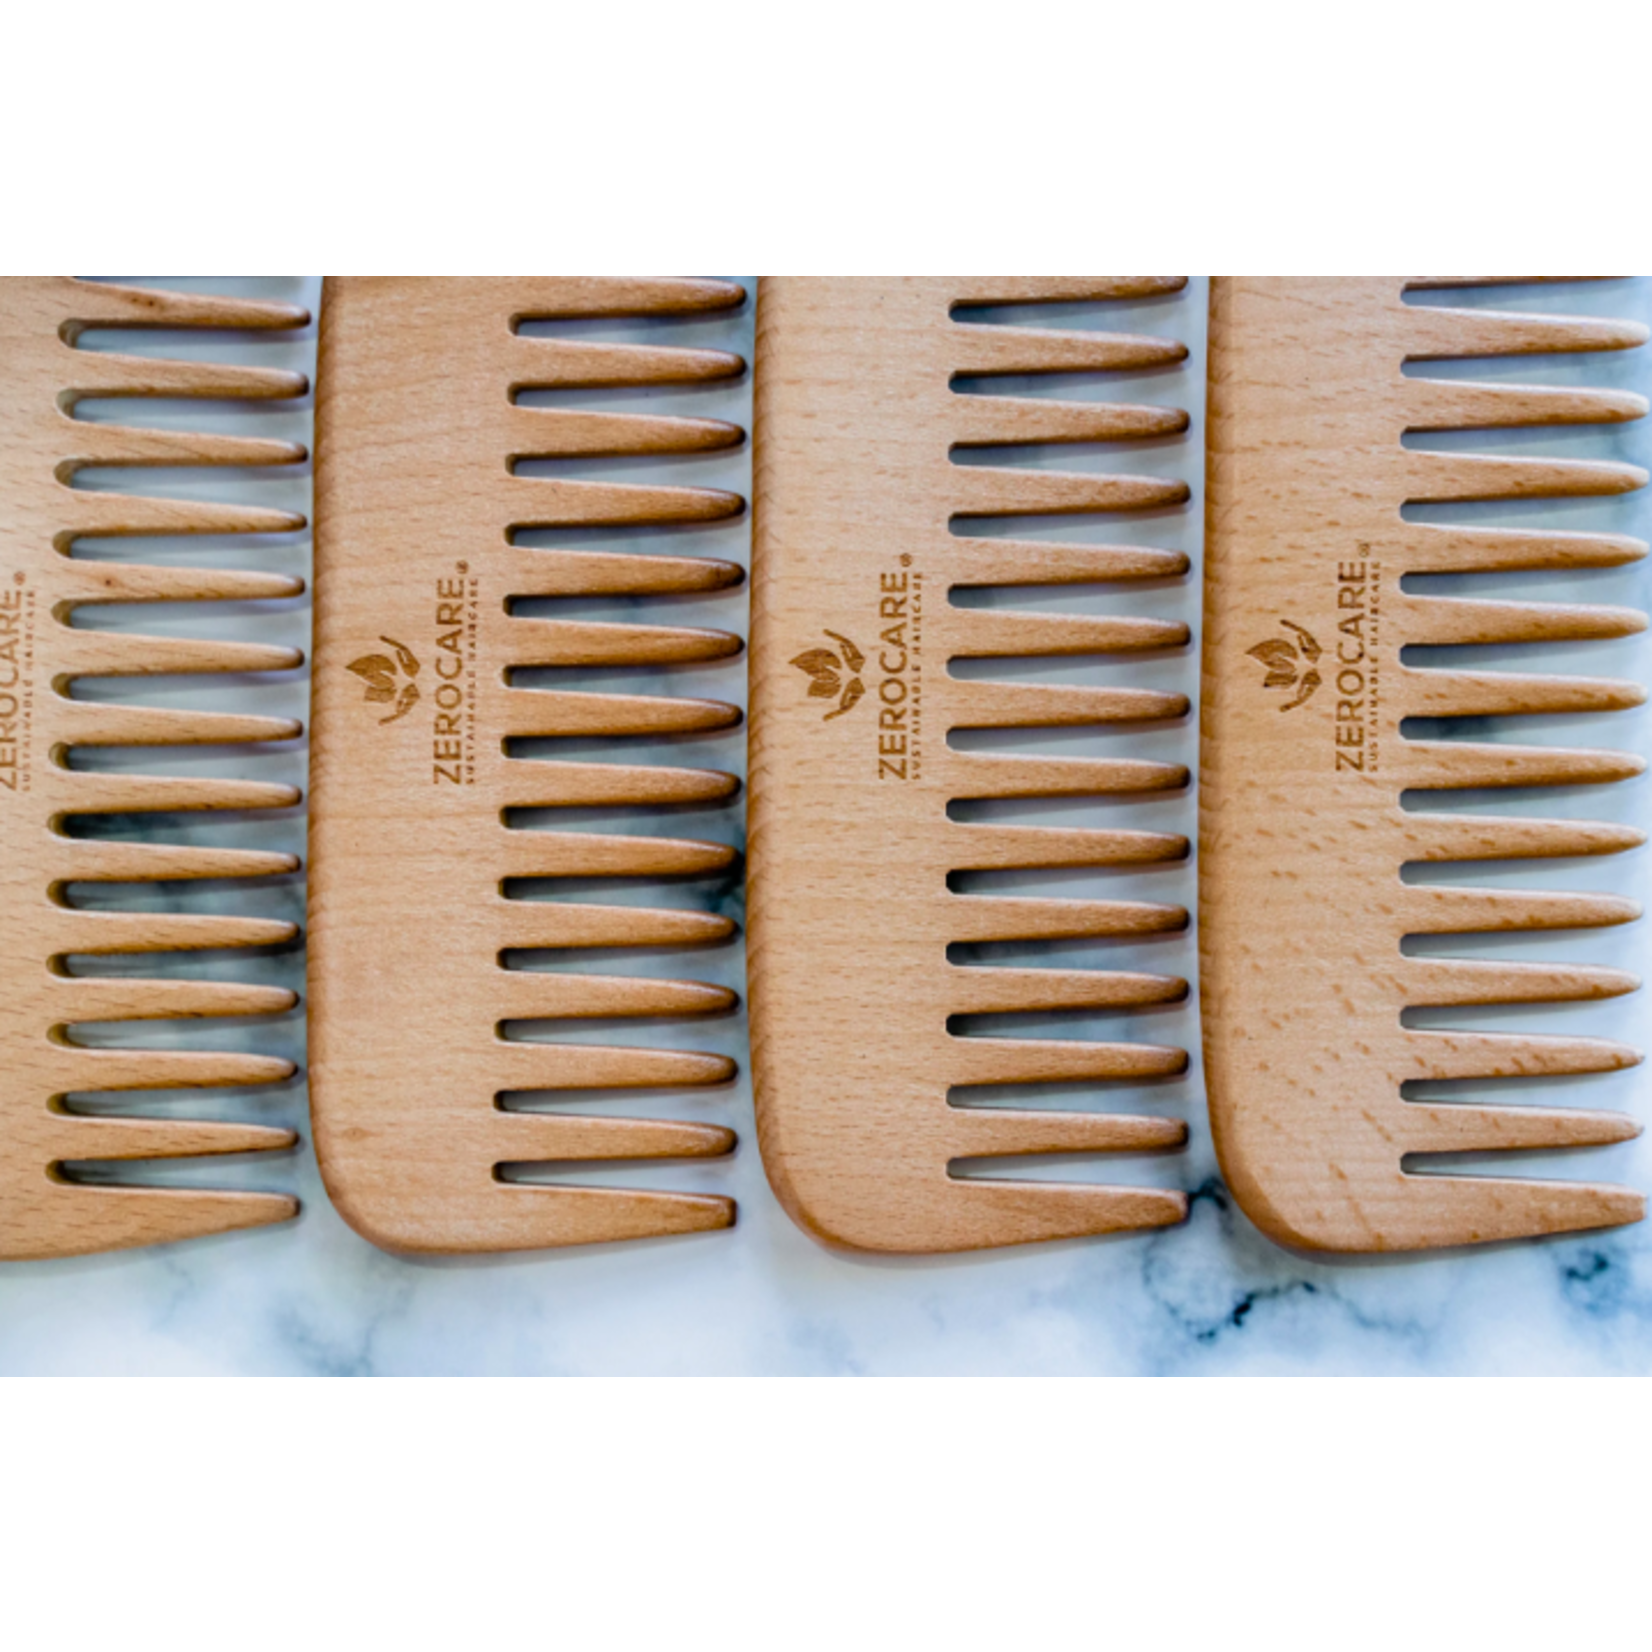 Zerocare Zerocare Bamboo Detangle Comb